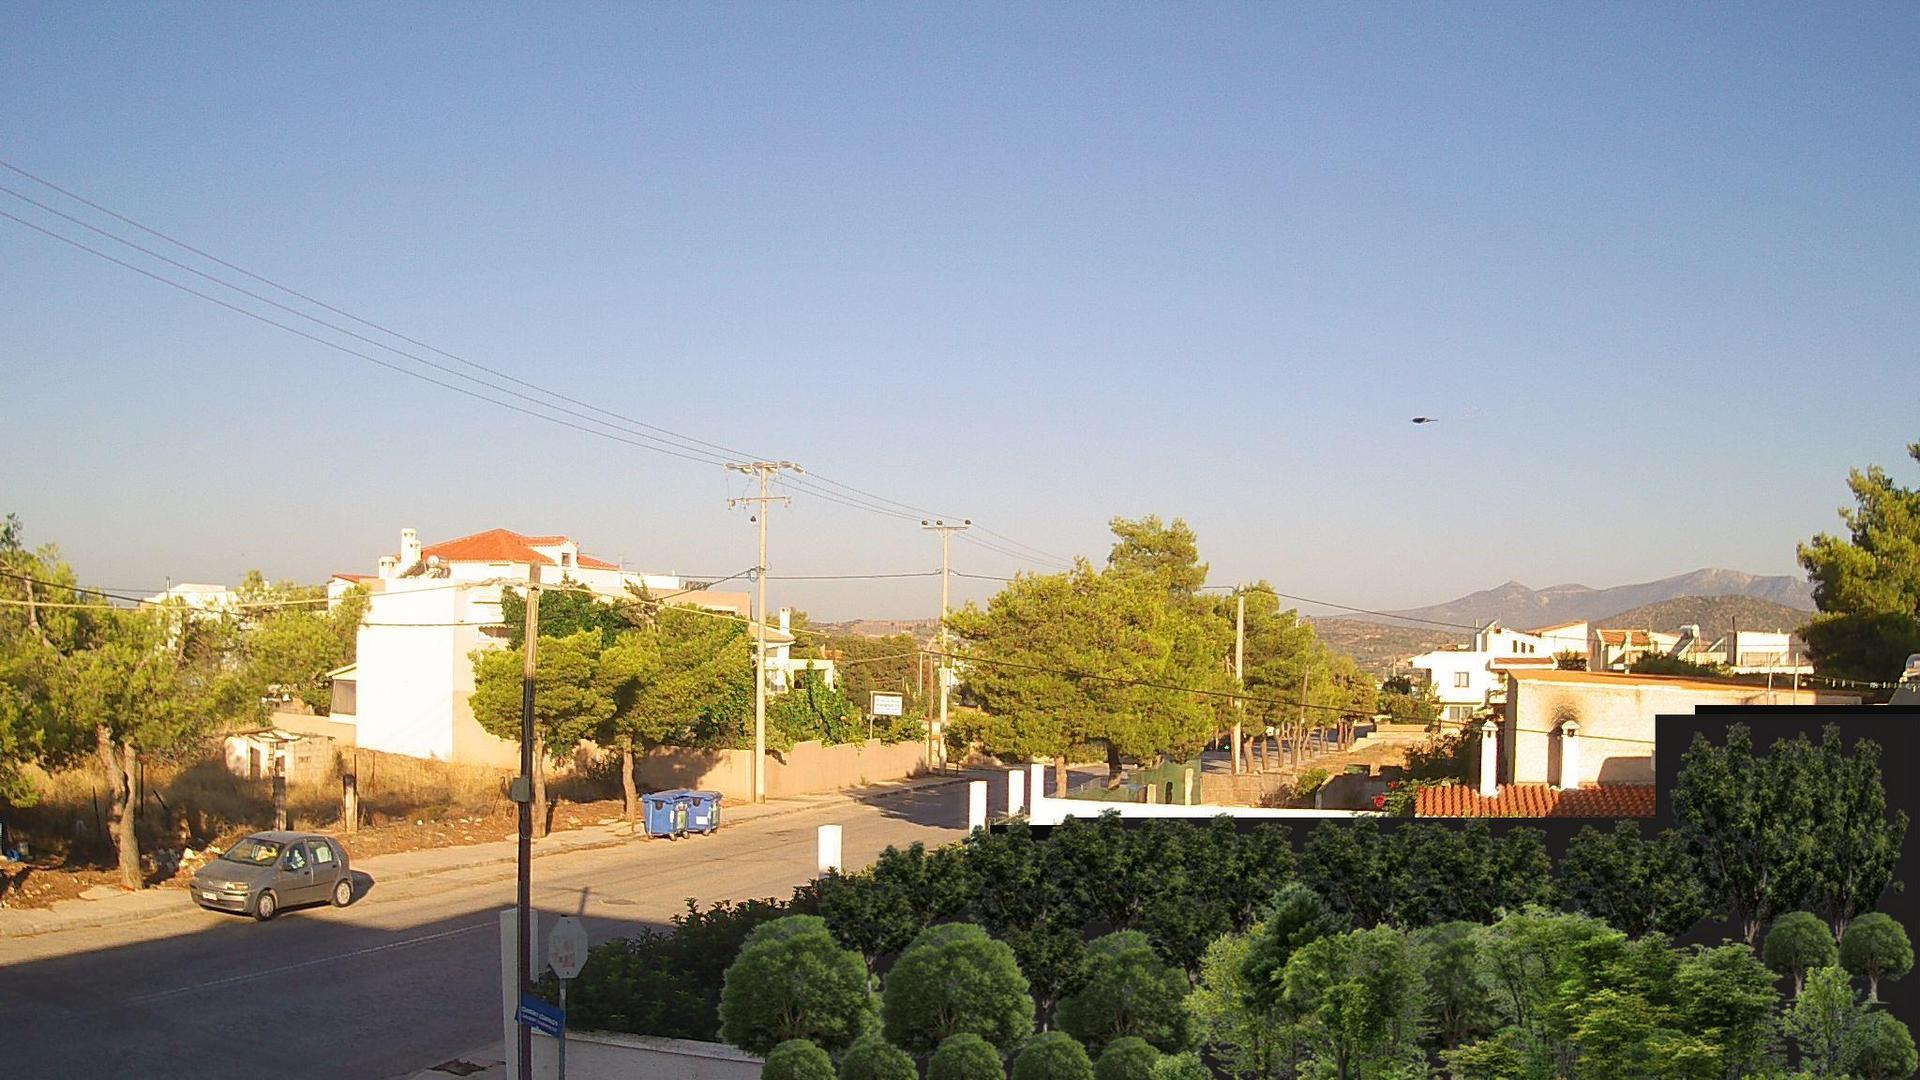 Webcam Καλύβια Θορικού: Kalyvia Thorikou − Ymittos